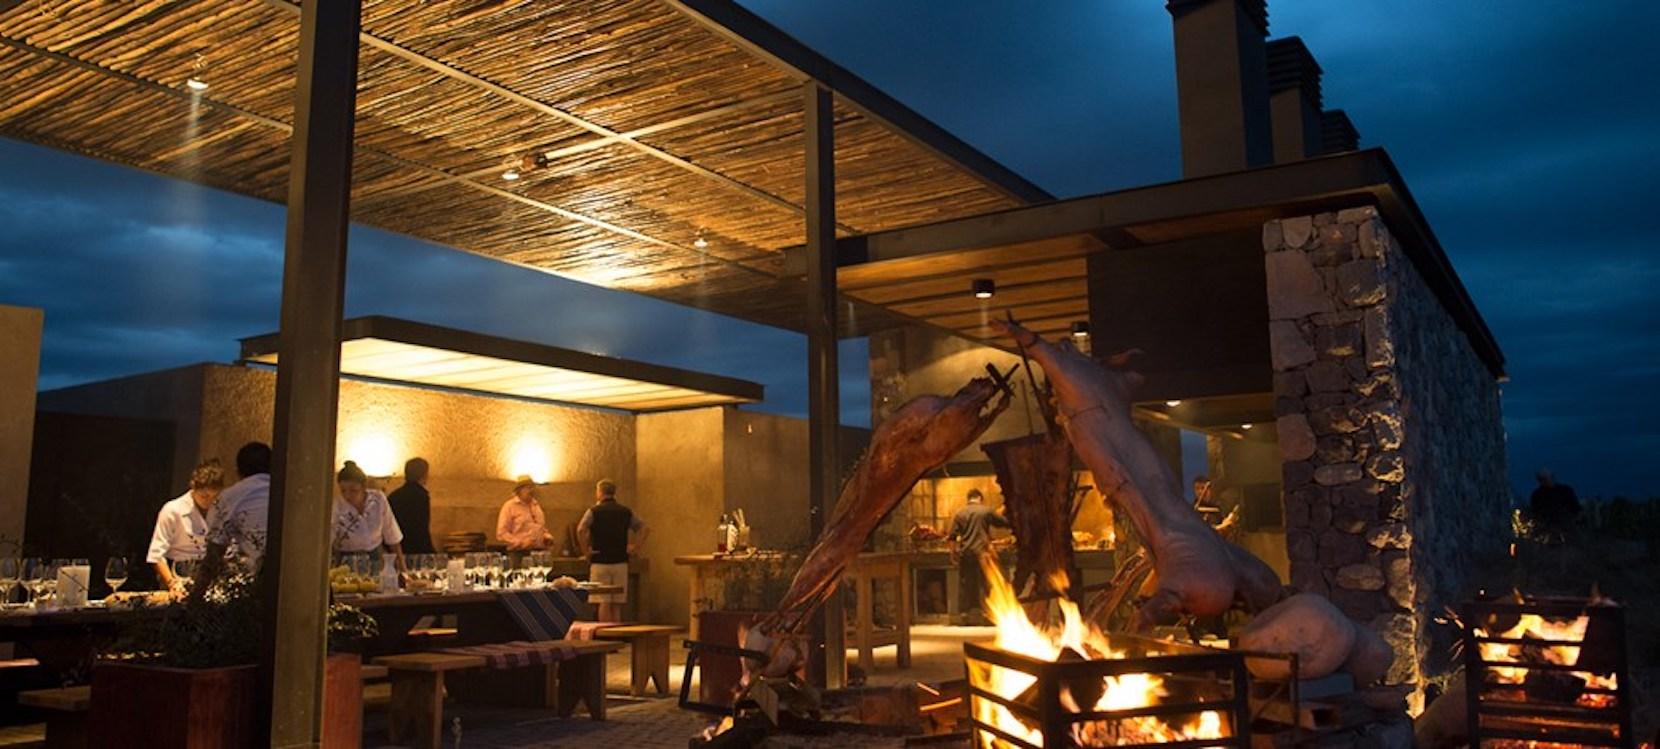 The Vines Resort & Spa , Mendoza / Argentina